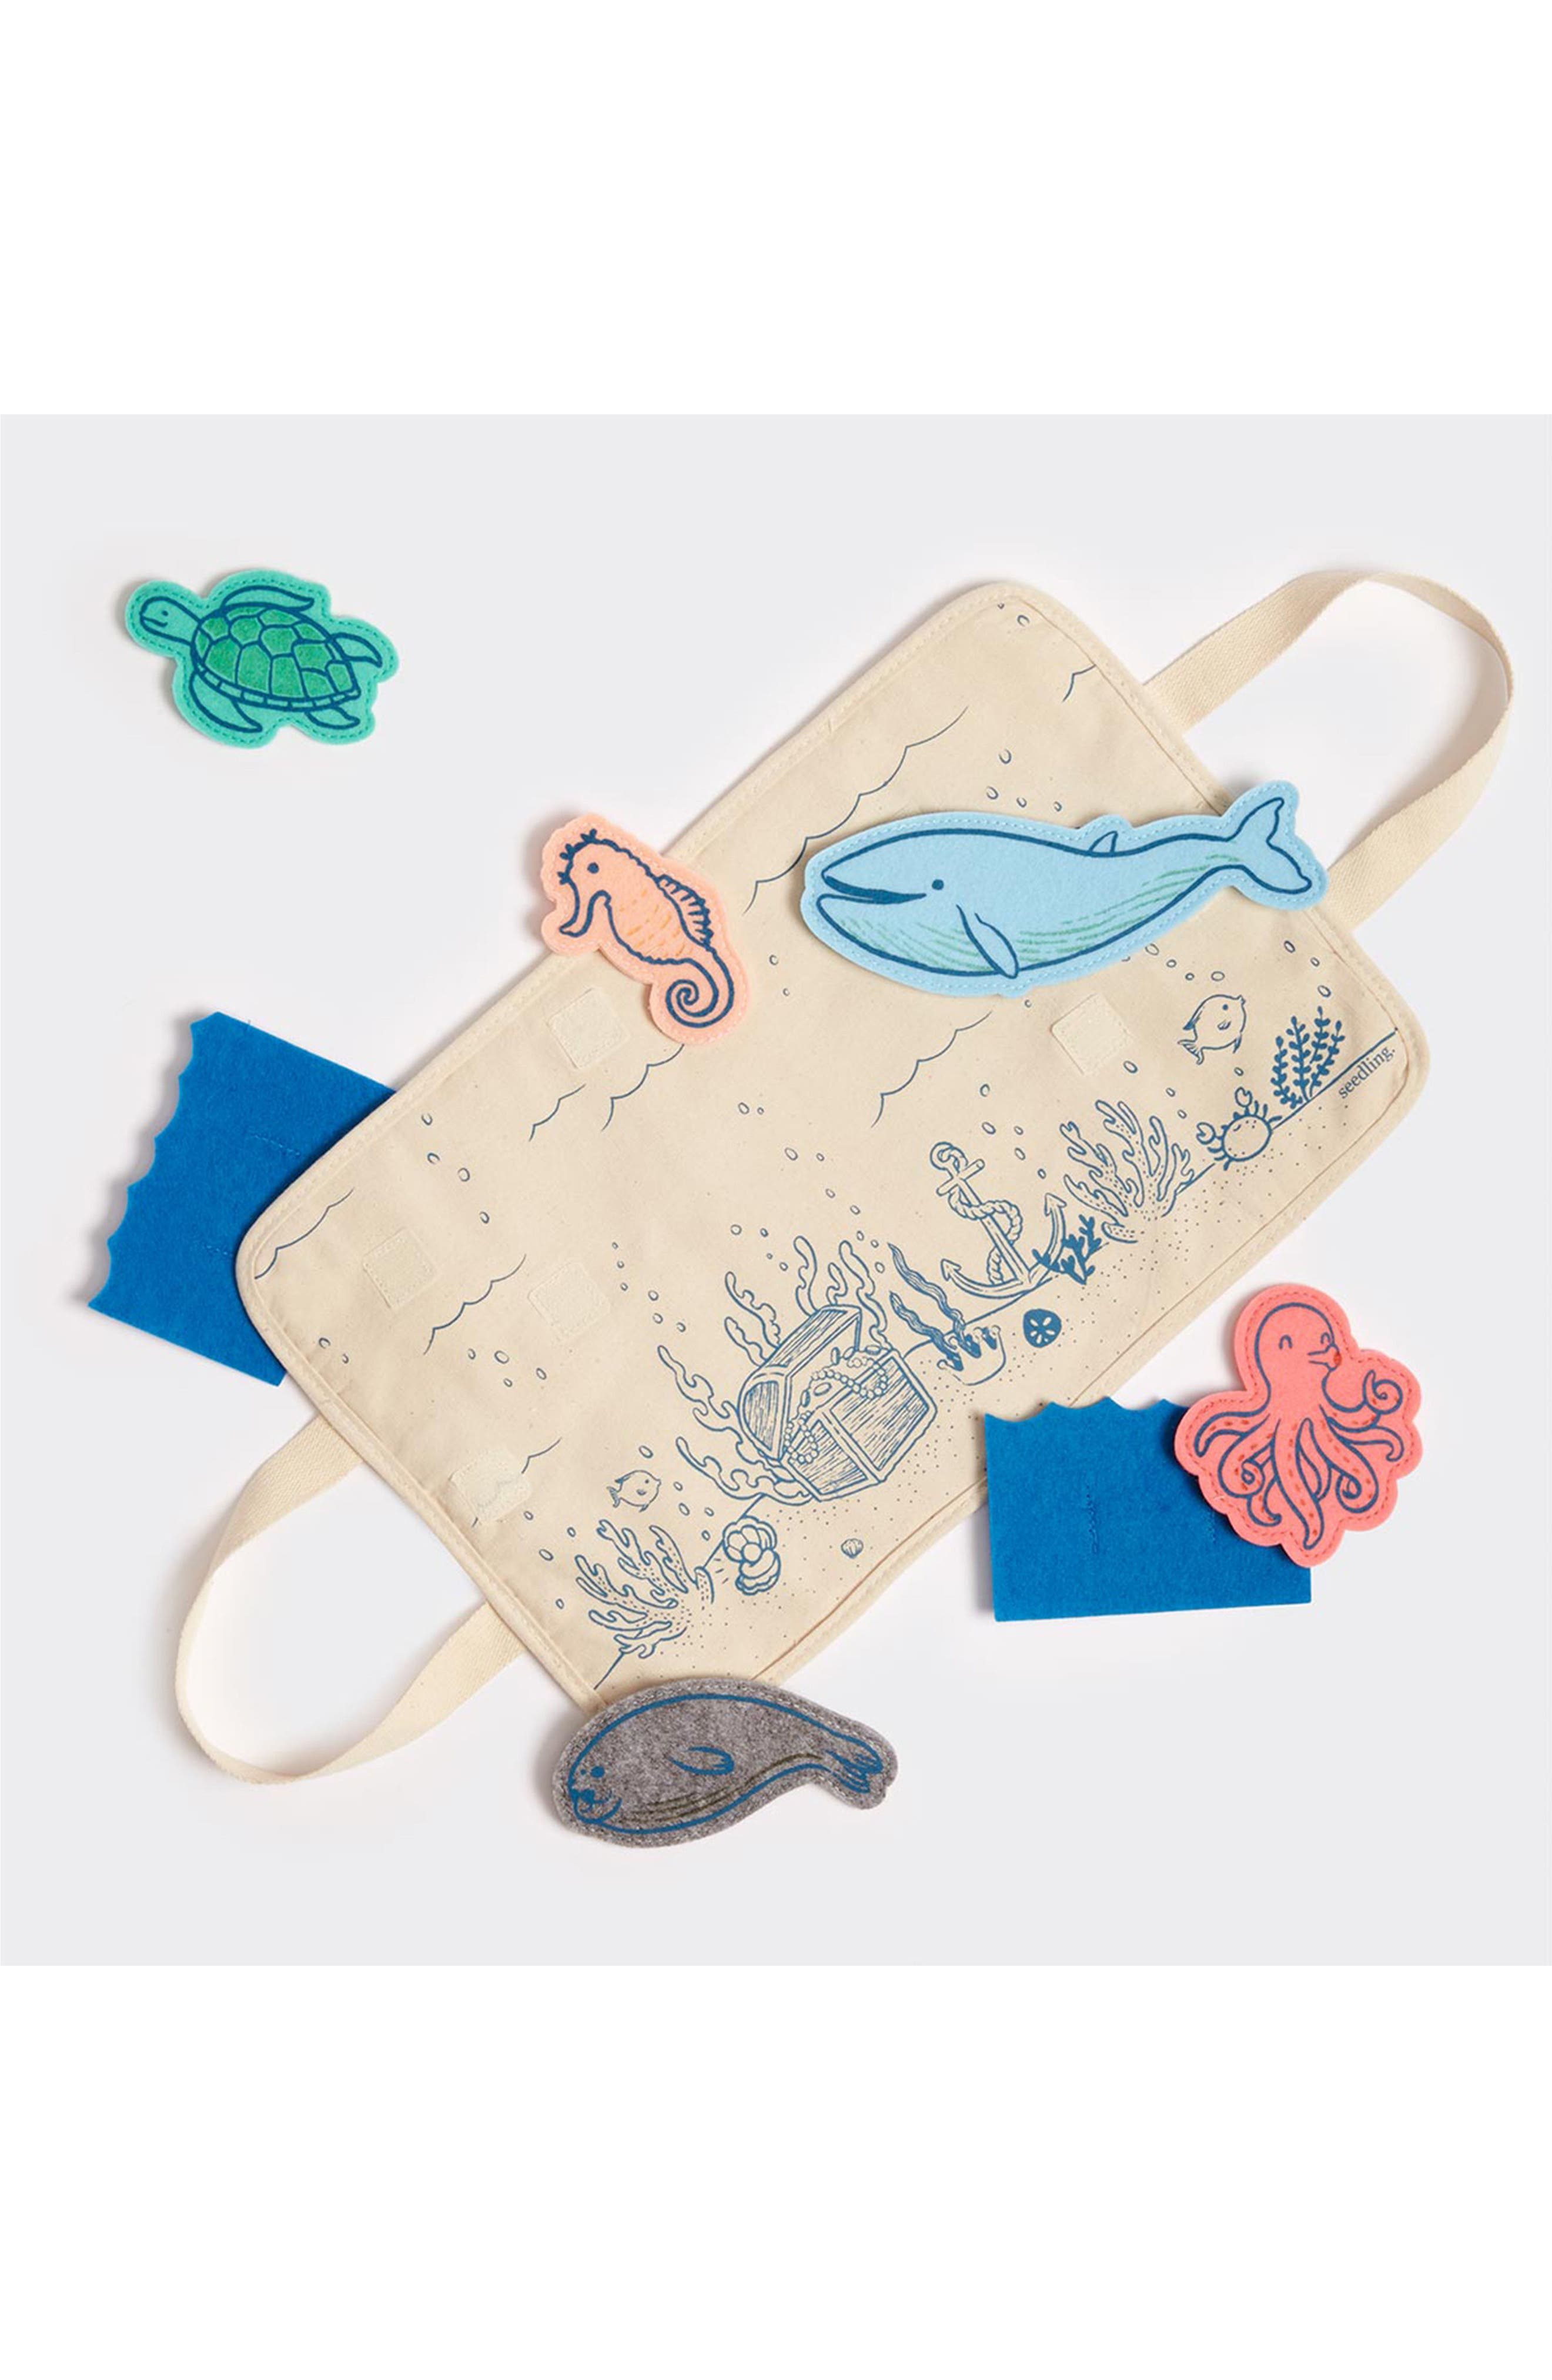 Alternate Image 3  - seedling Under the Sea Puppet Playtime Kit